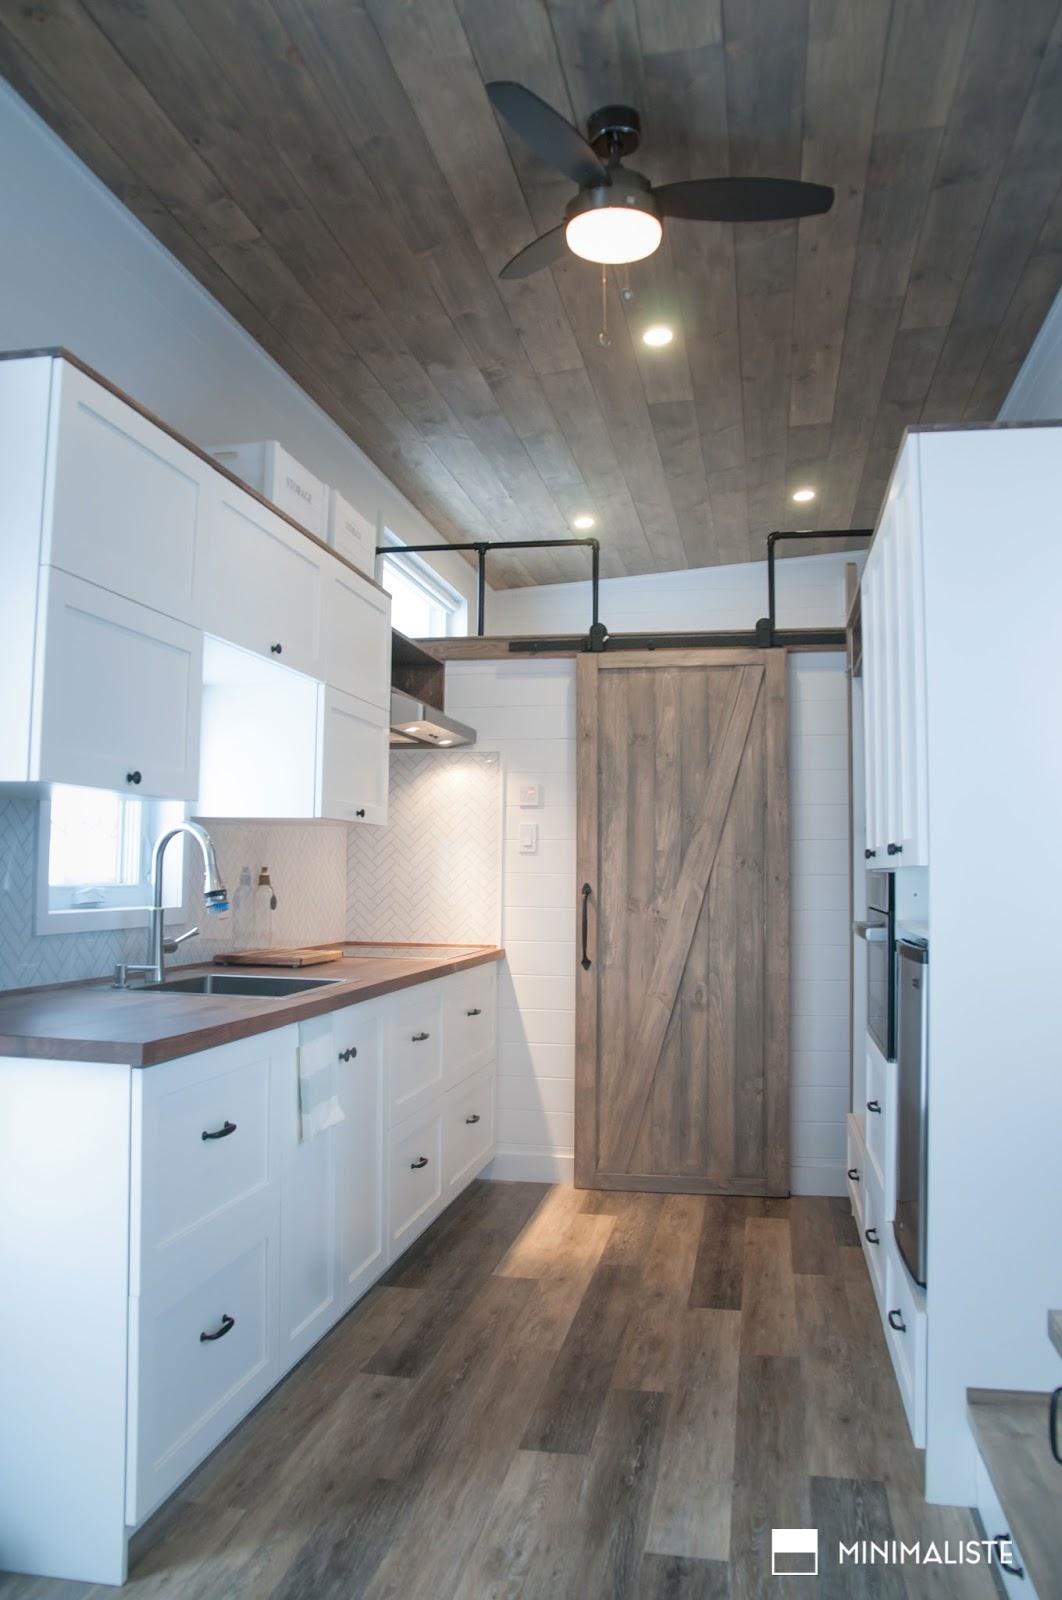 5 Tiny House Designs 2019 Plan Designs Around The World: The Ébène From Minimaliste